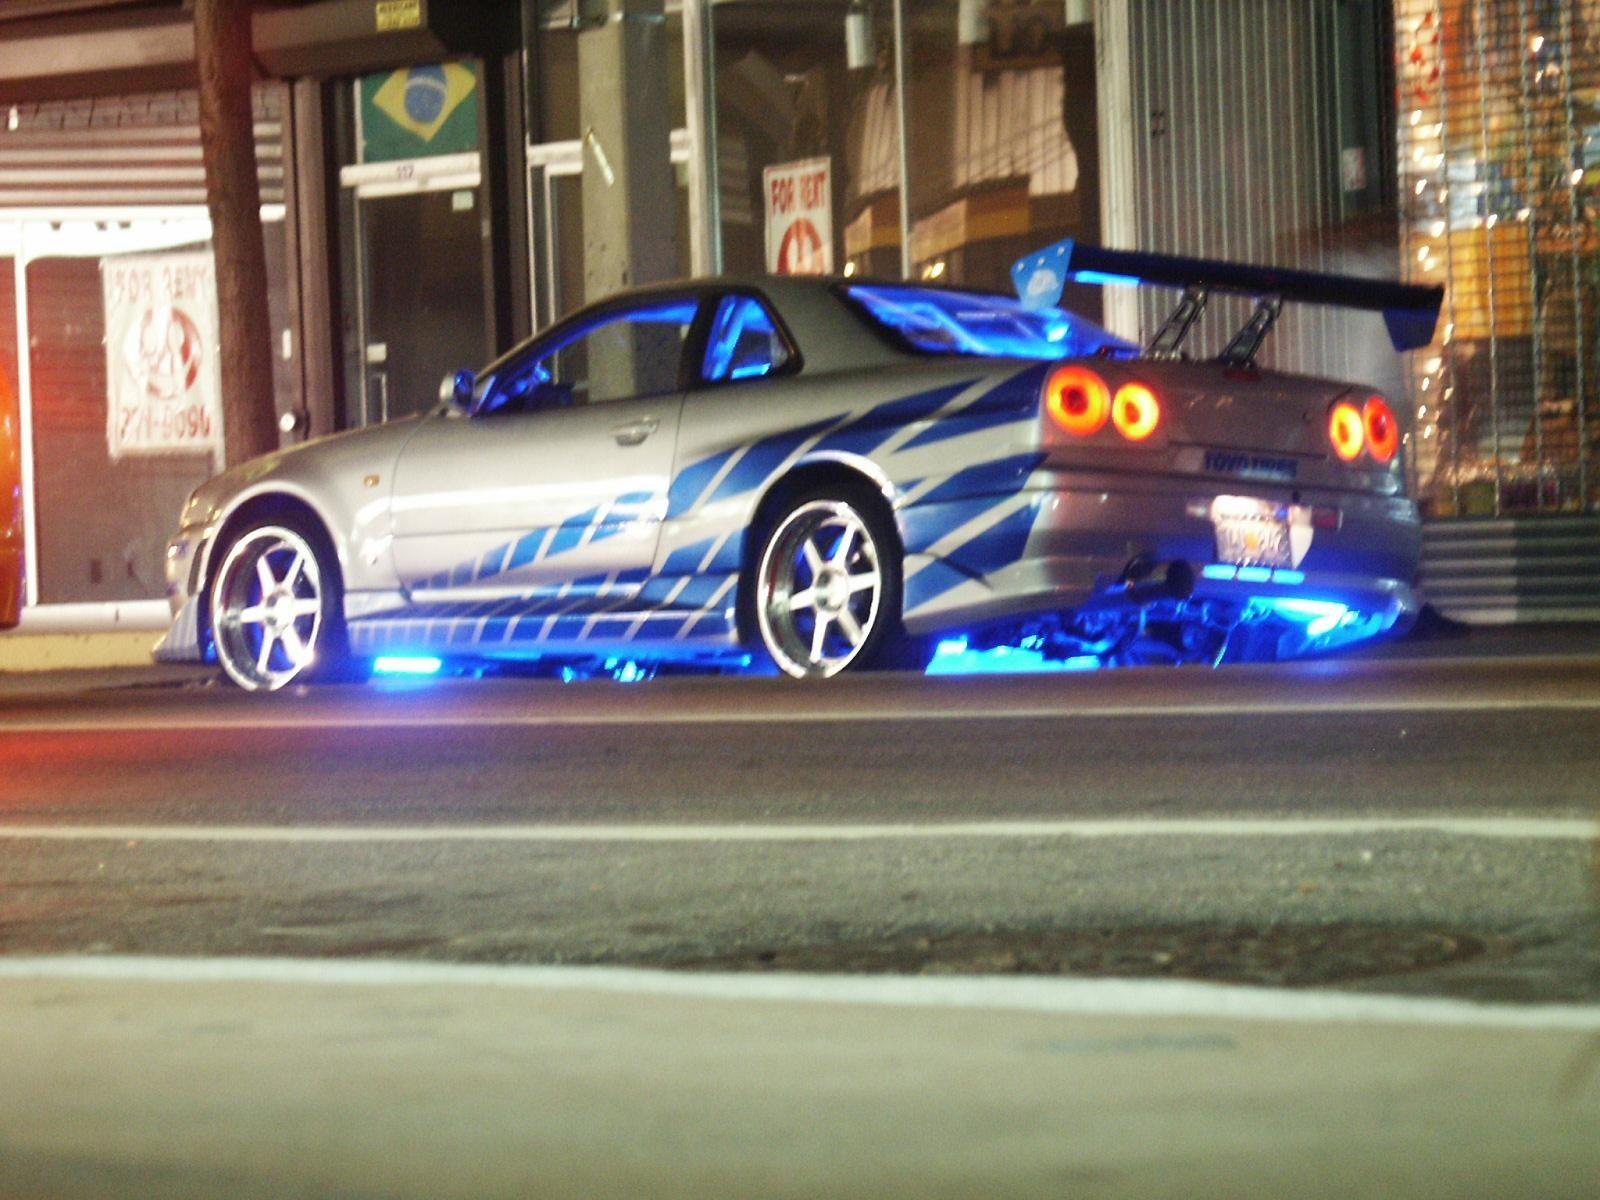 Nissan nissan deportivos nissan gt r nissan gt r r35 tuning cars - Nissan Skyline Gt R R34 Fast Furious 1999